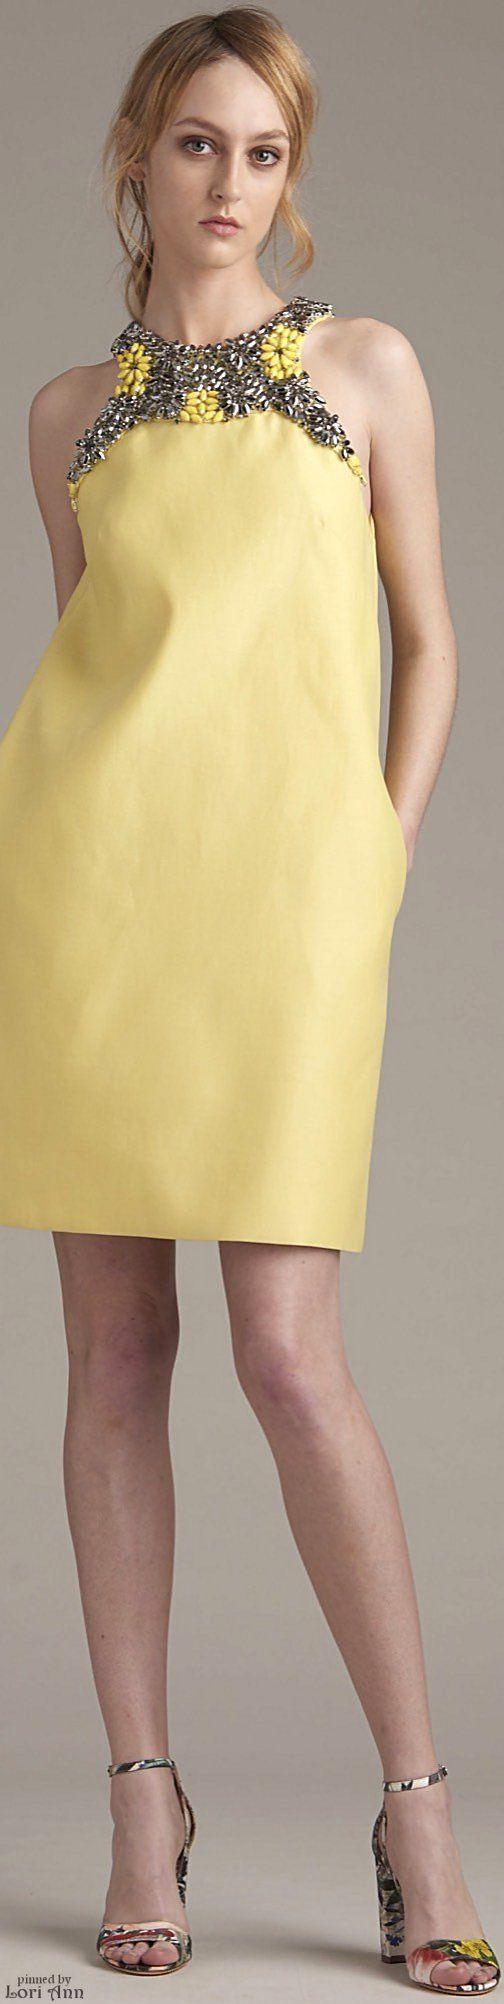 best nice dress images on pinterest